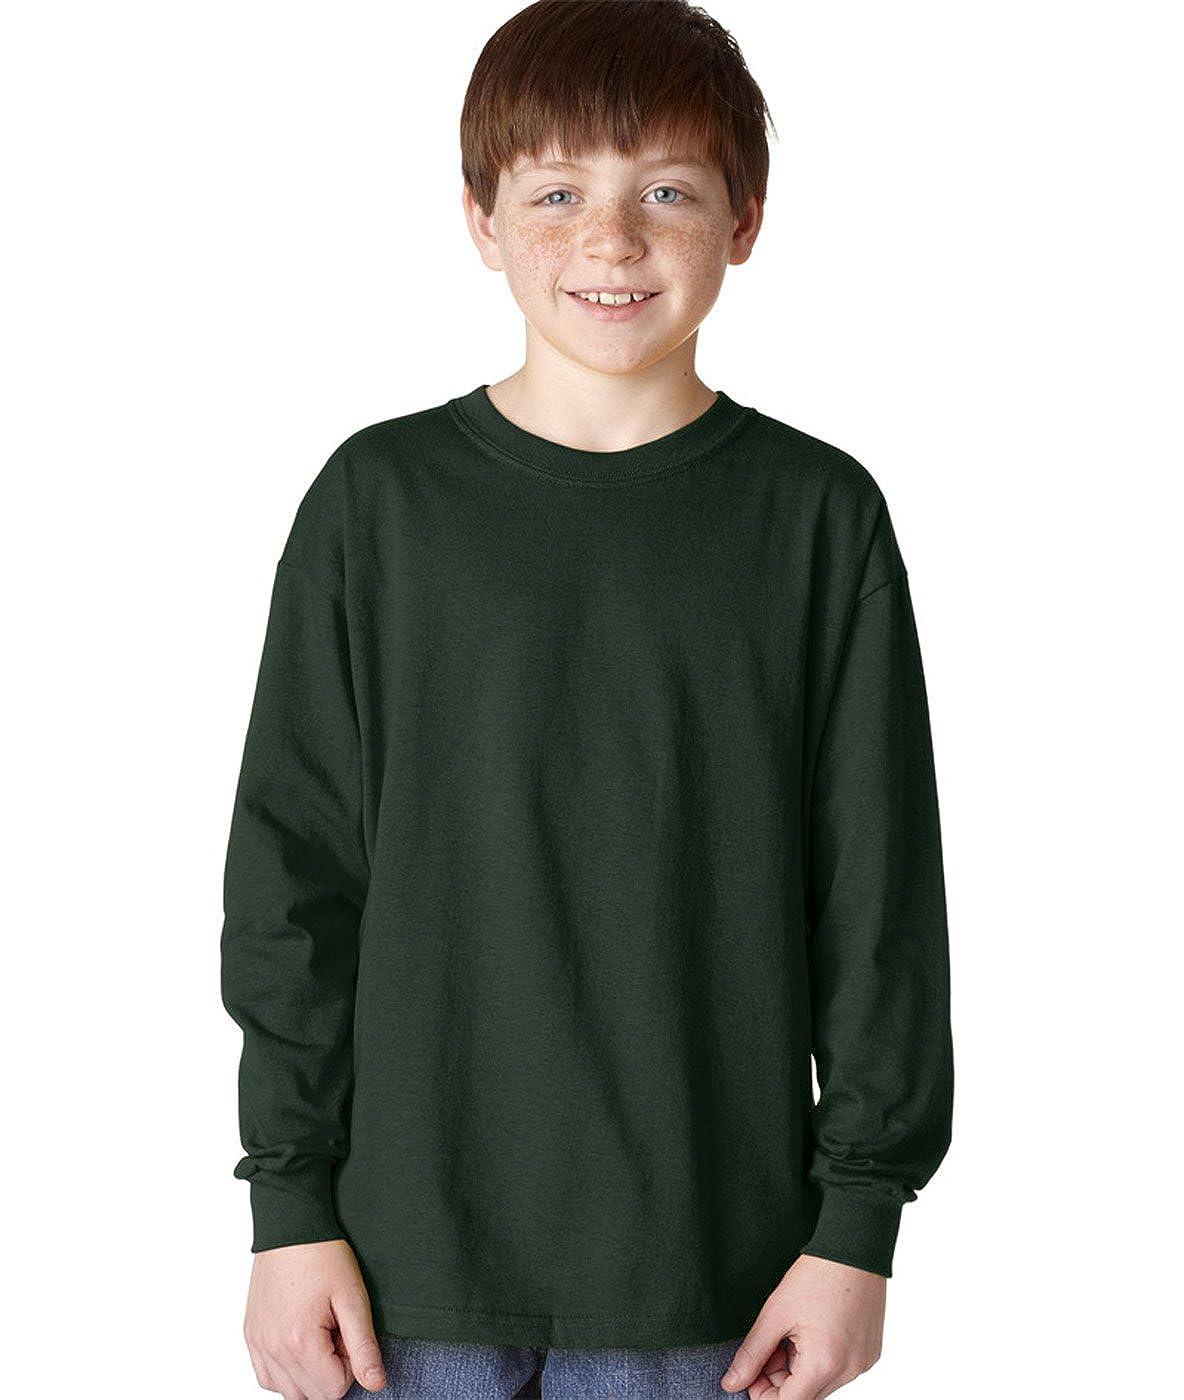 Heavy Cotton Long-Sleeve T-Shirt G540B -FOREST GRE -XL-12PK Gildan Boys 5.3 oz